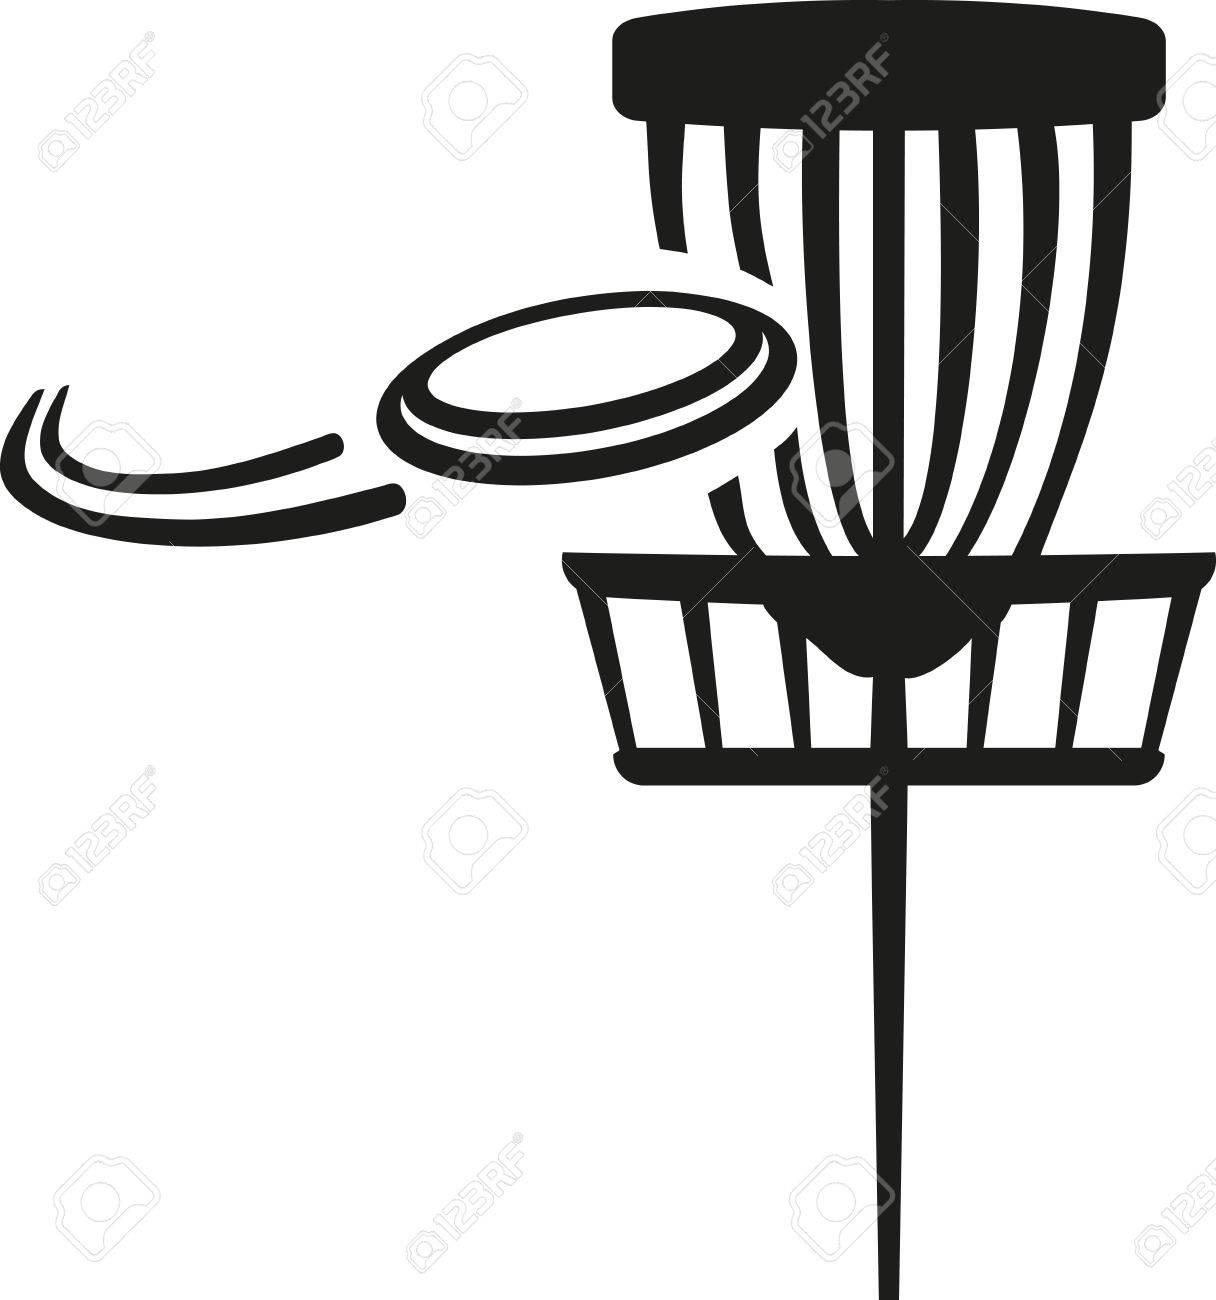 Disc golf basket with flying disk.